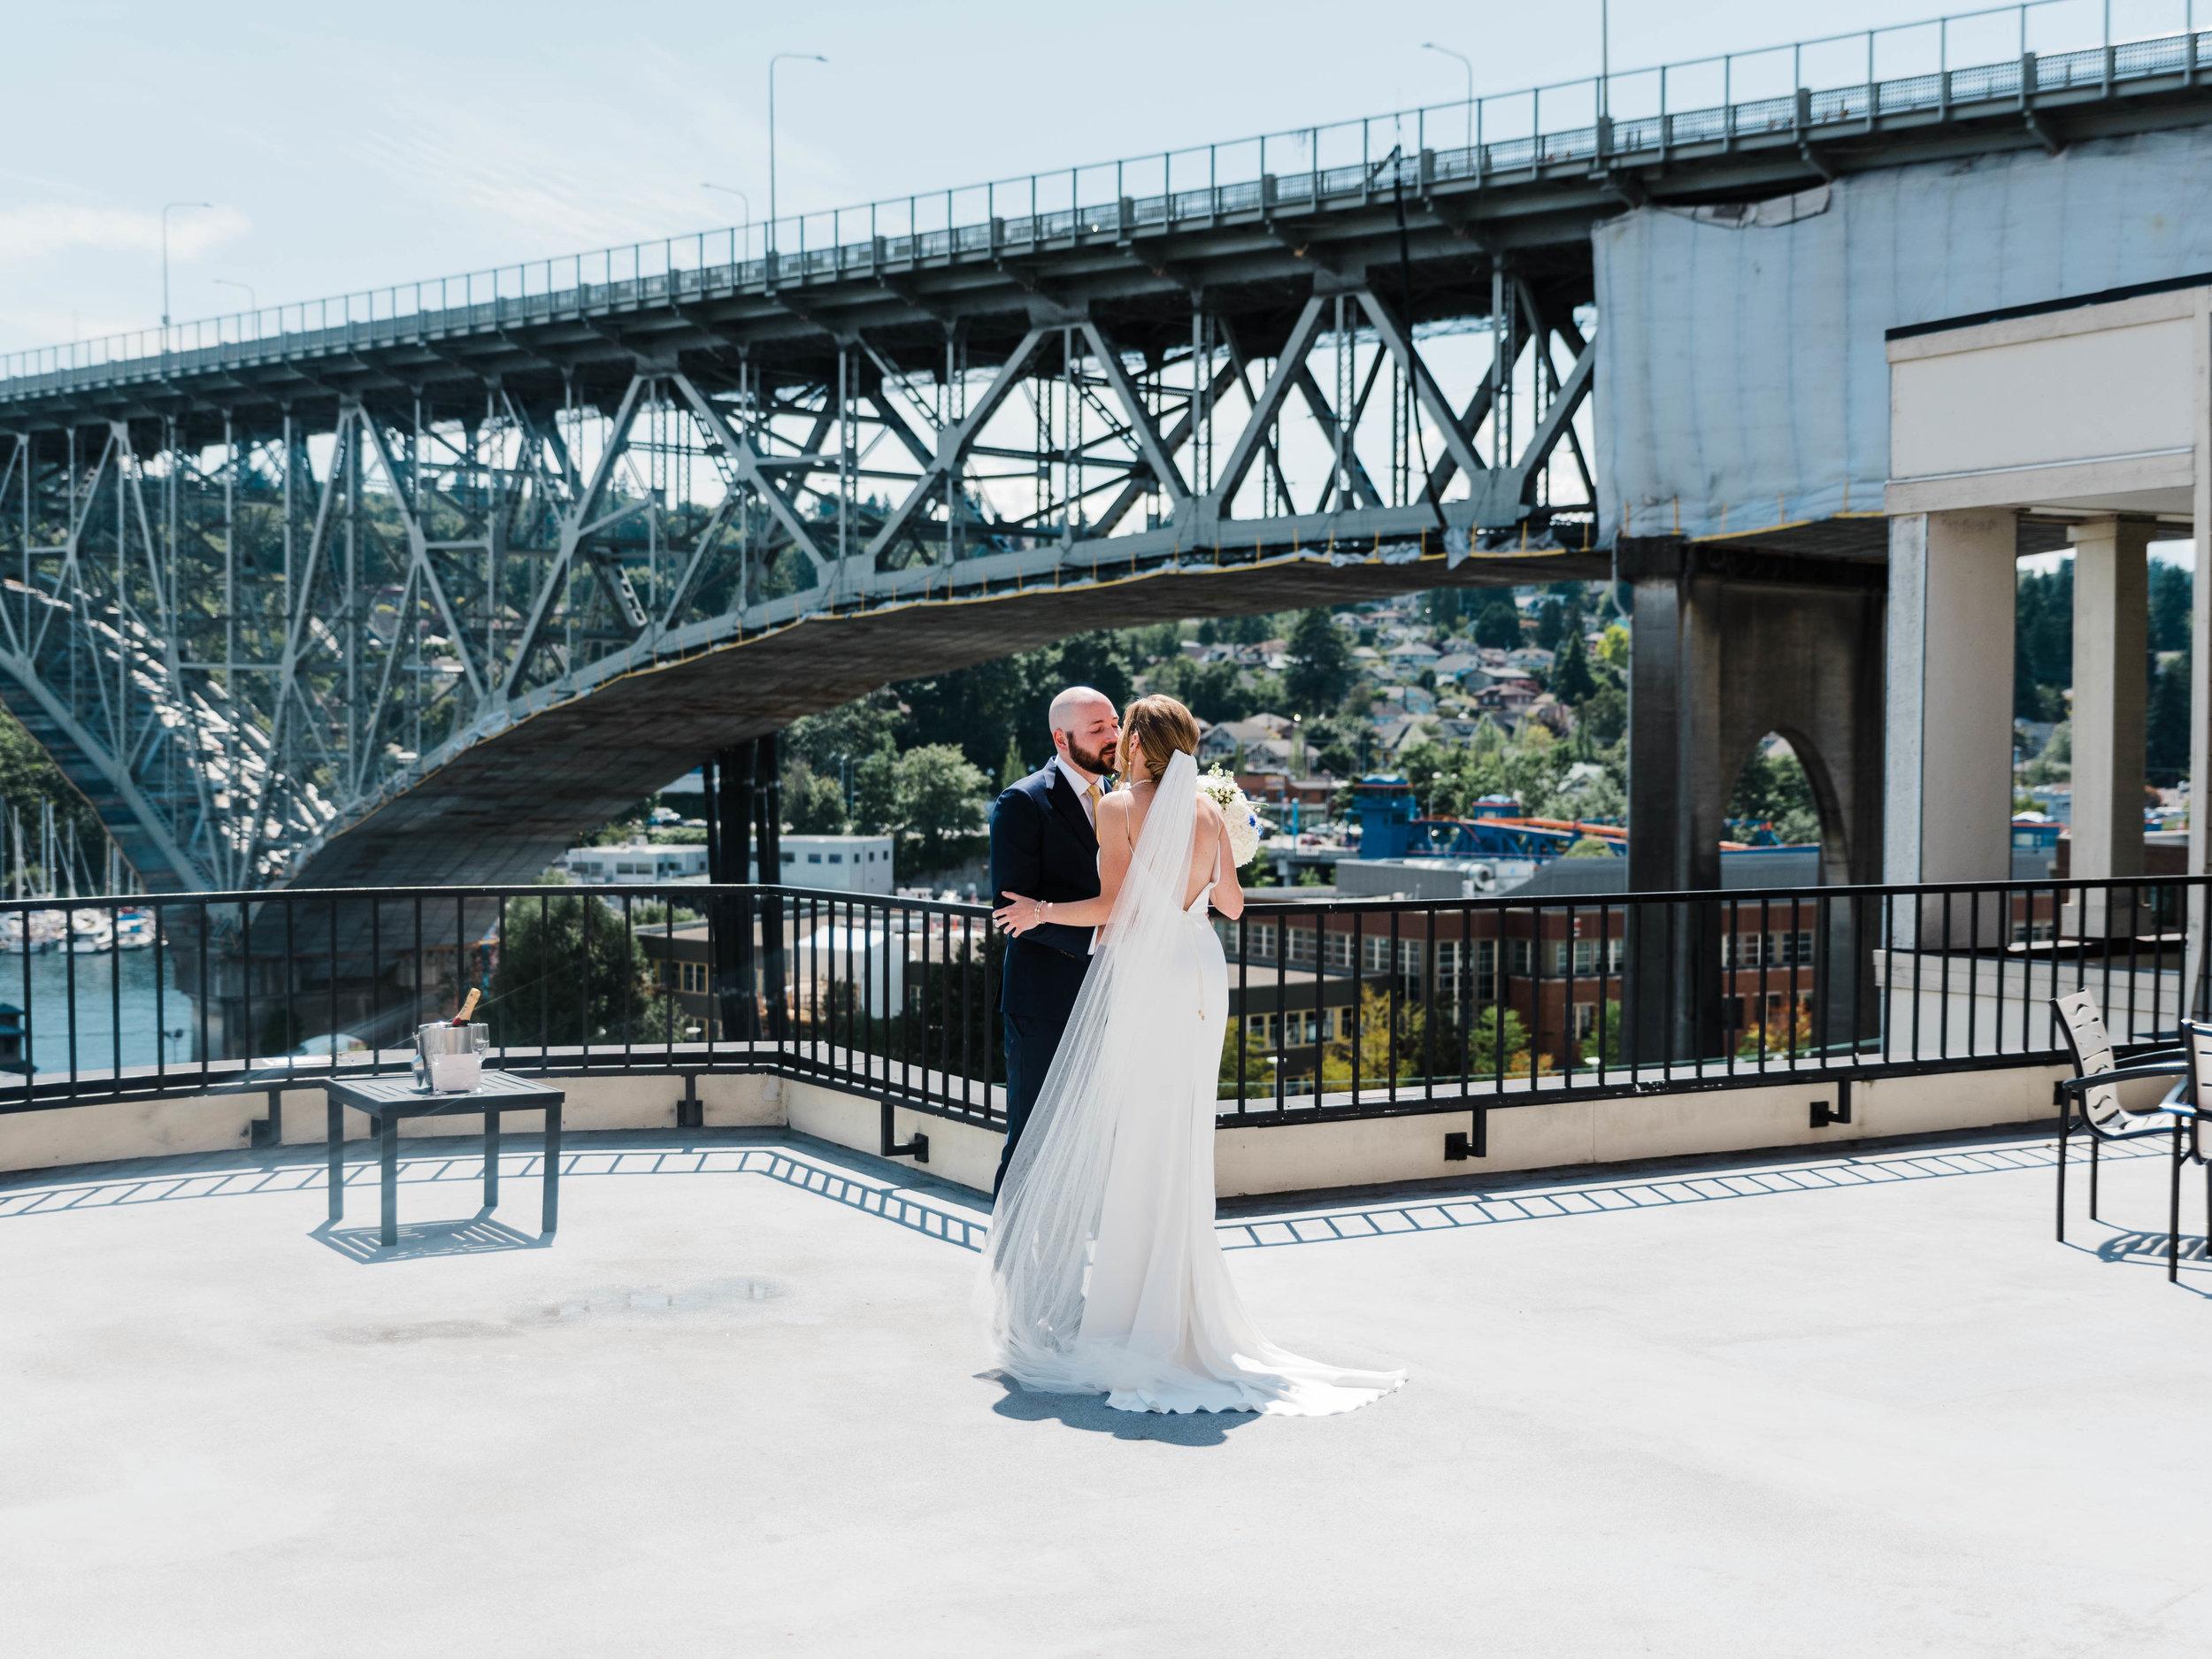 Seattle Wedding- MV Skansonia - Anna + Josh -  (377).jpg